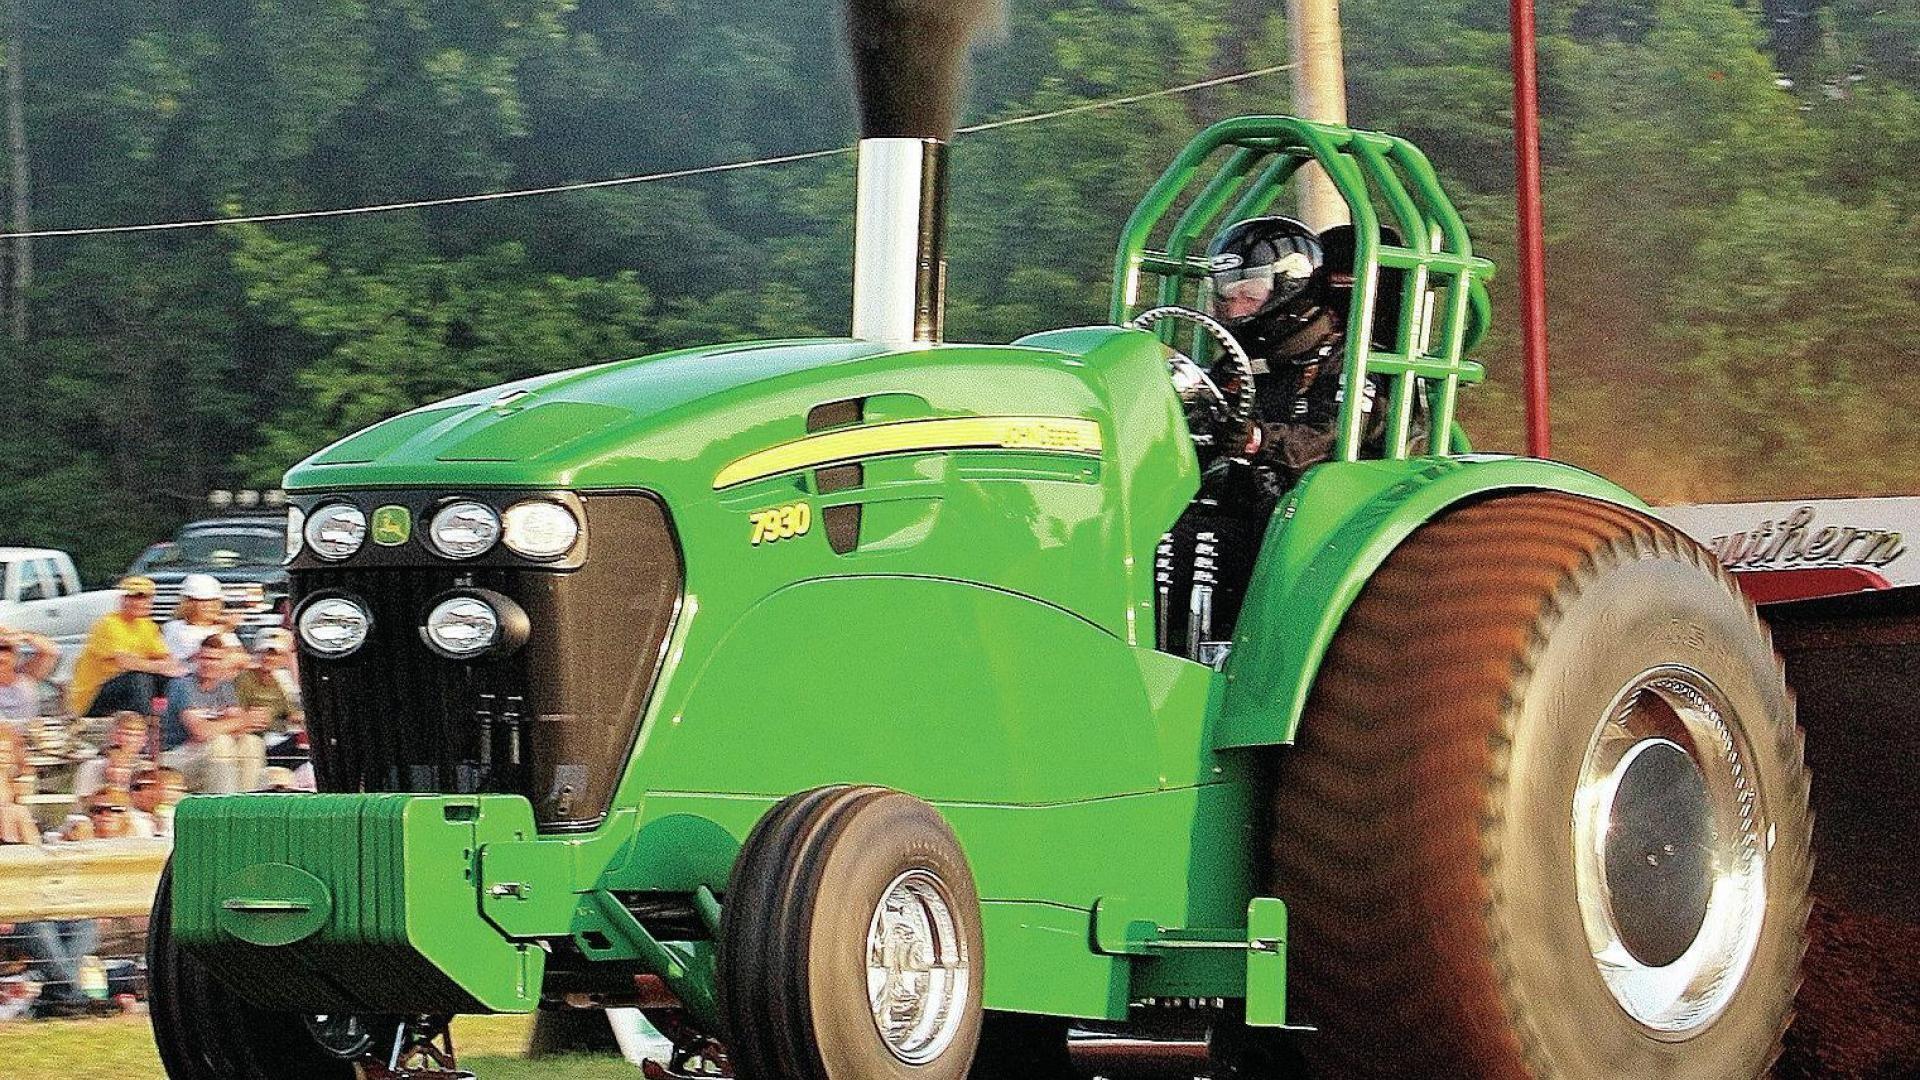 Tractor Wallpaper HD